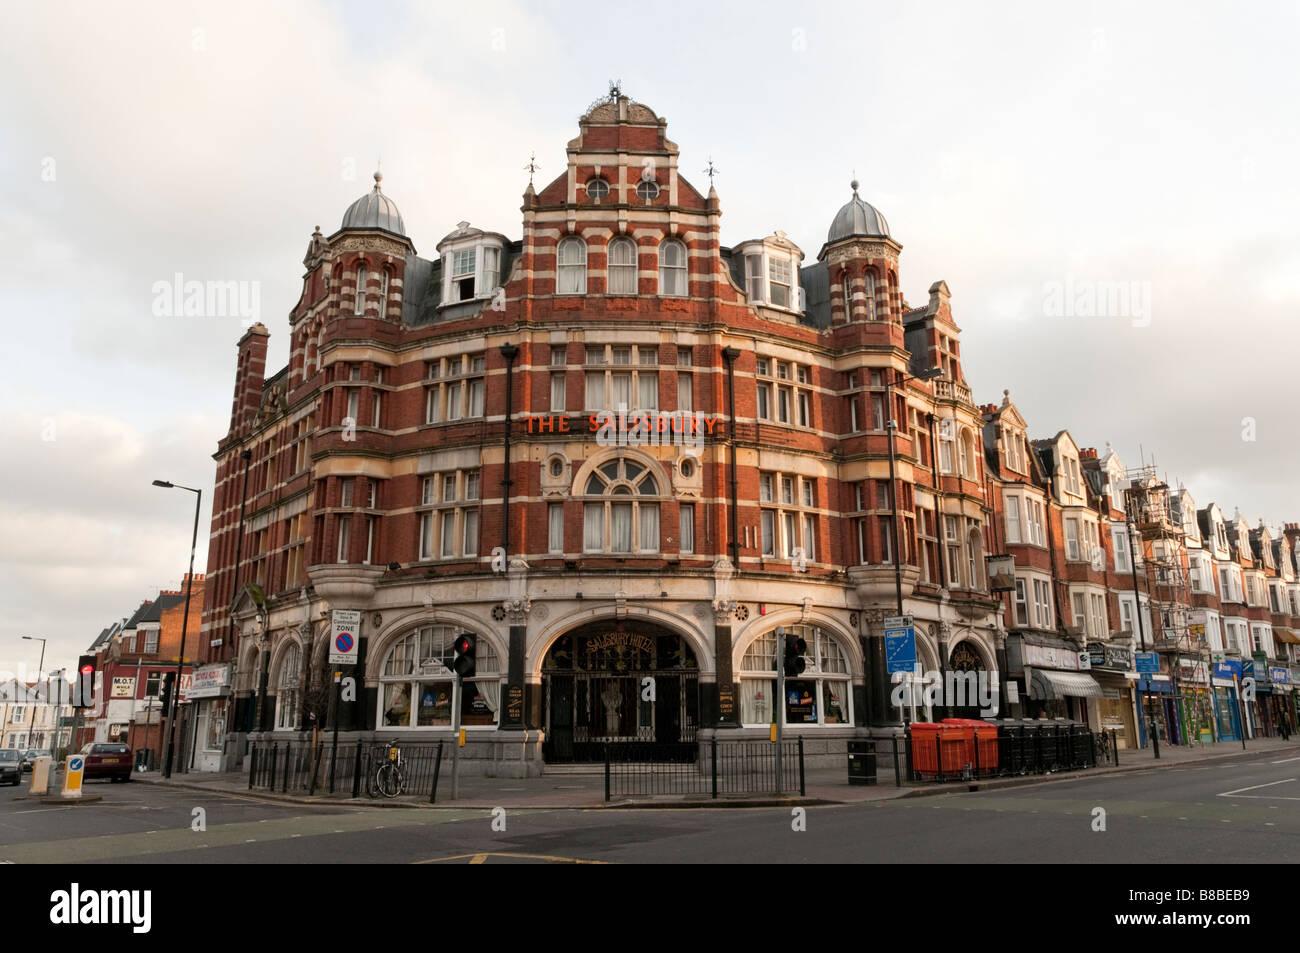 The Salisbury pub on Green Lanes in Haringey London England UK - Stock Image